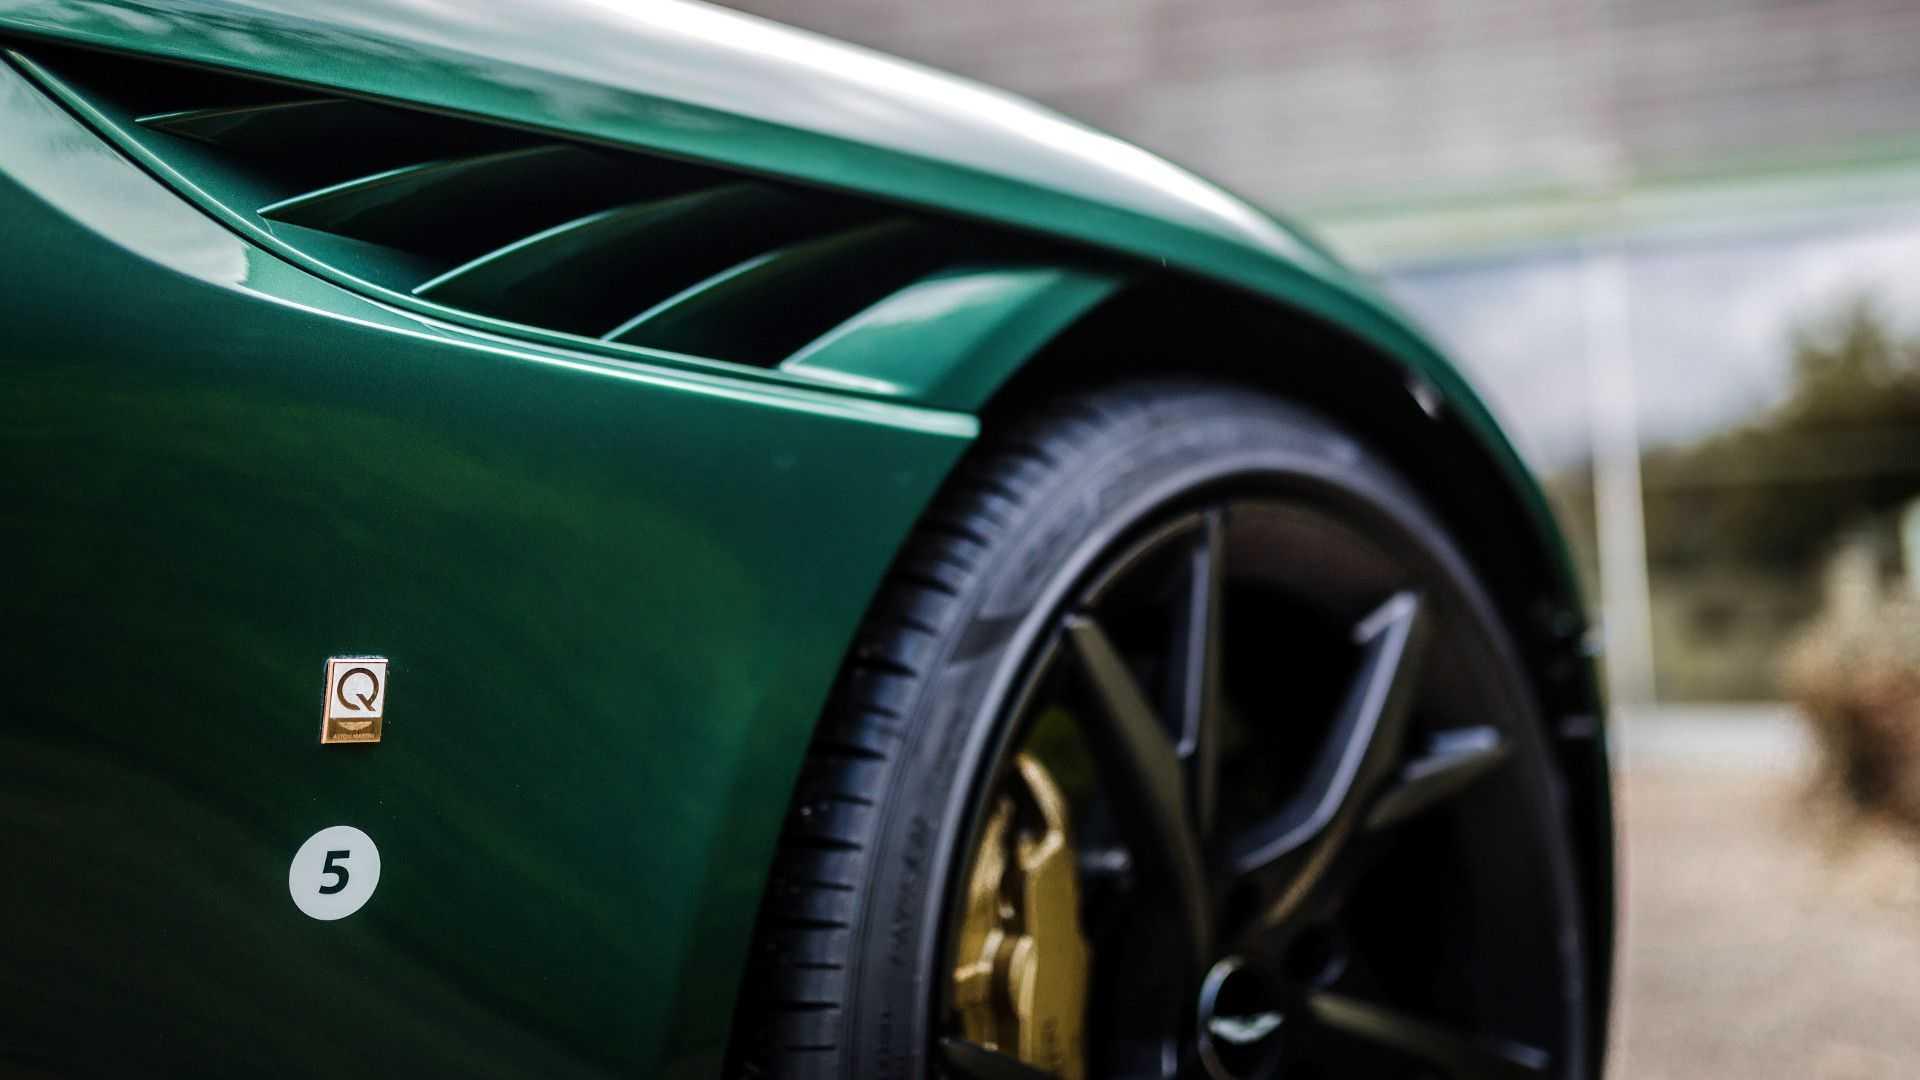 2019 Aston Martin DBS 59 Wheel Wallpapers (4)